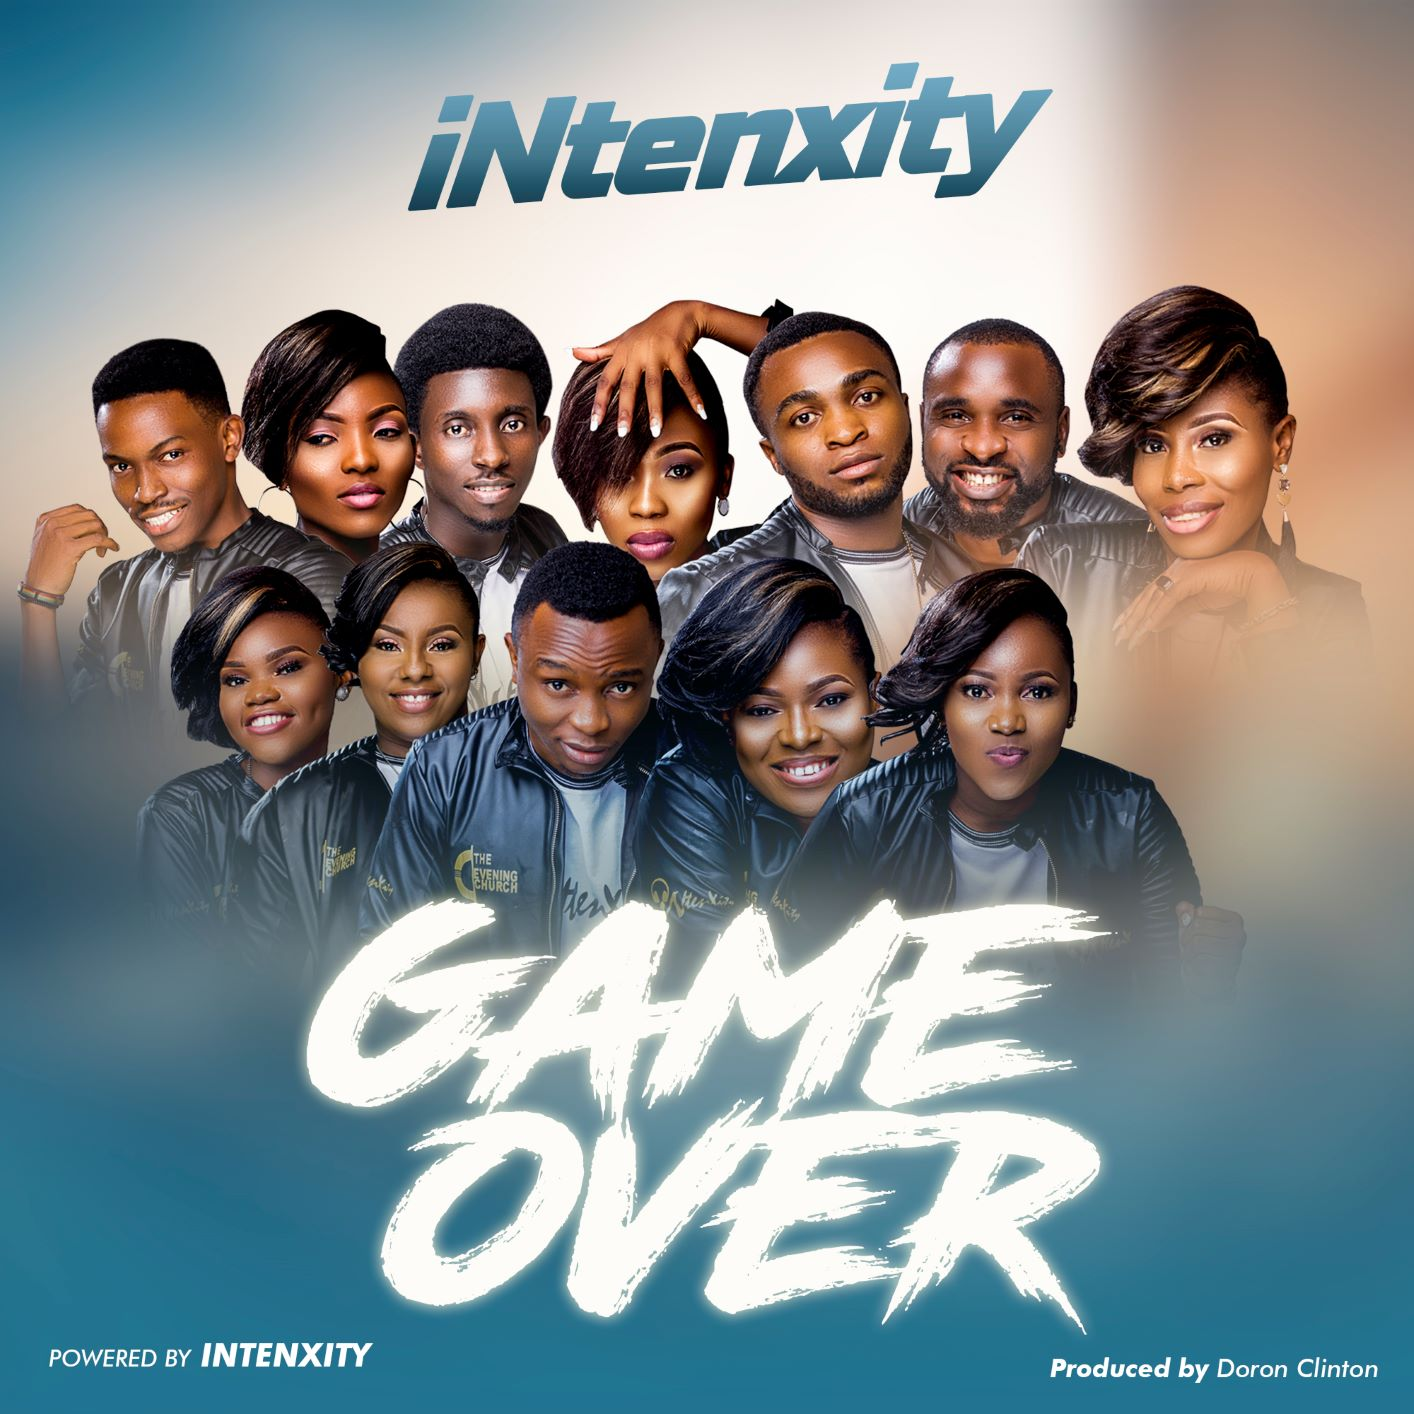 iNtenxity Game Over